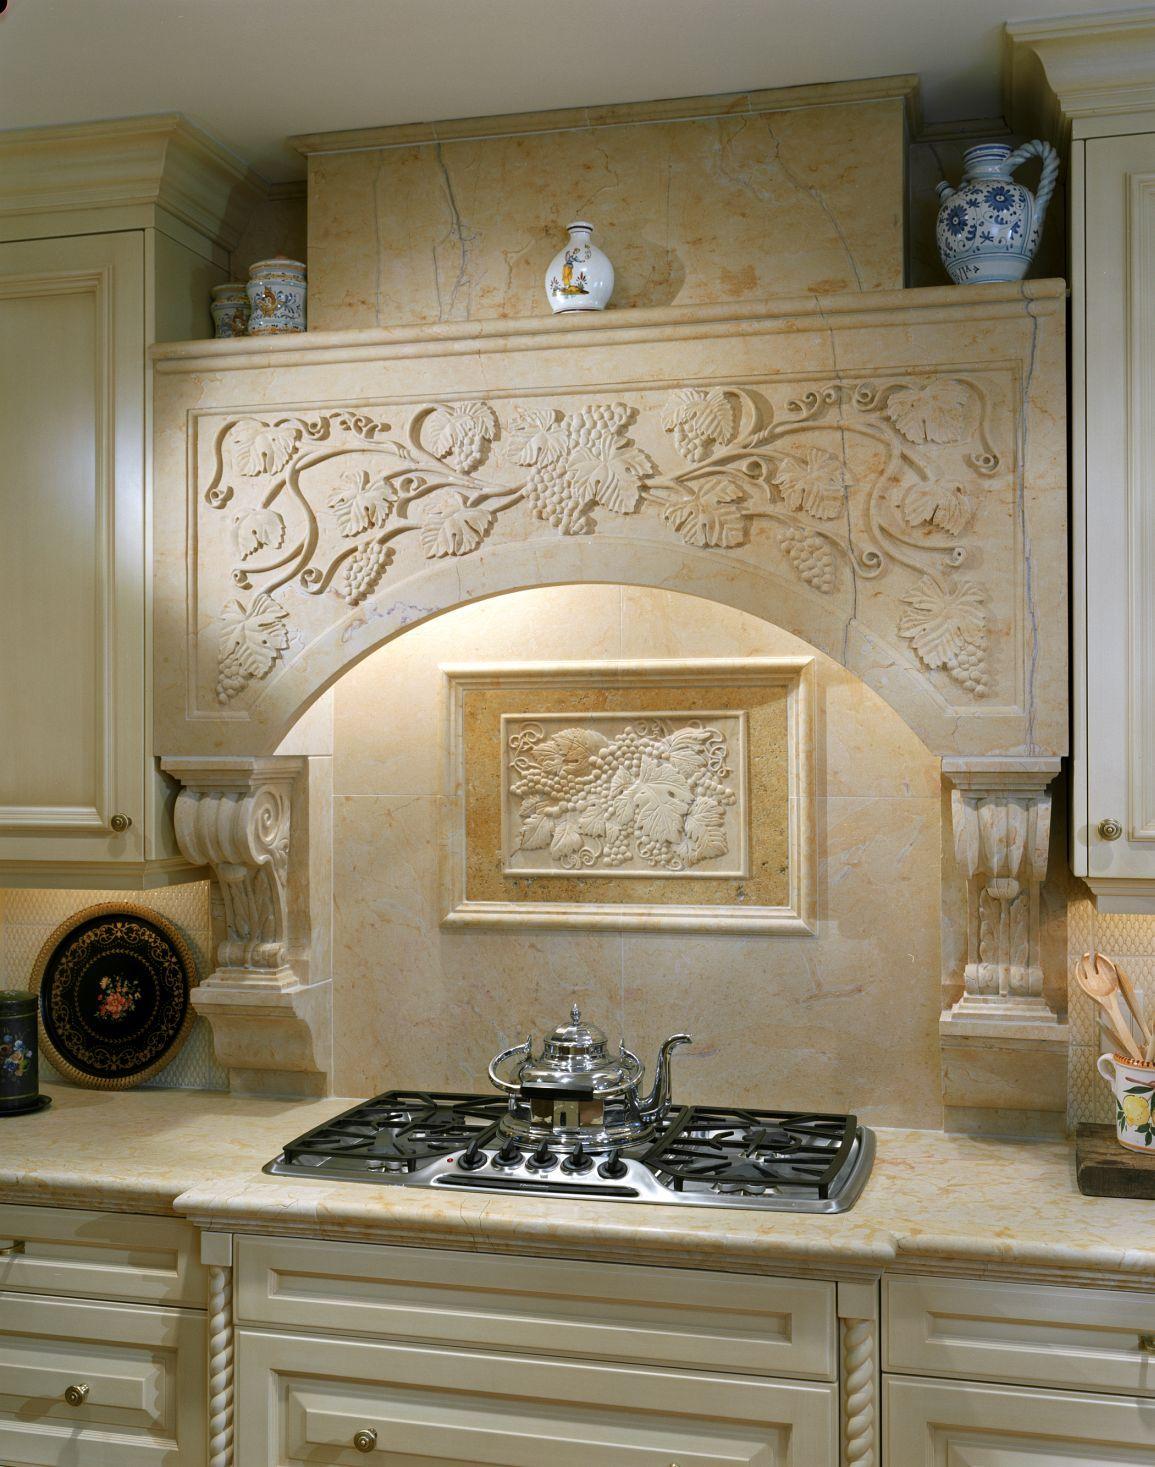 Best Kitchen Gallery: Kitchen Hoods Hearths In Natural Stone By Materials Marketing of Stone Kitchen Hoods on rachelxblog.com